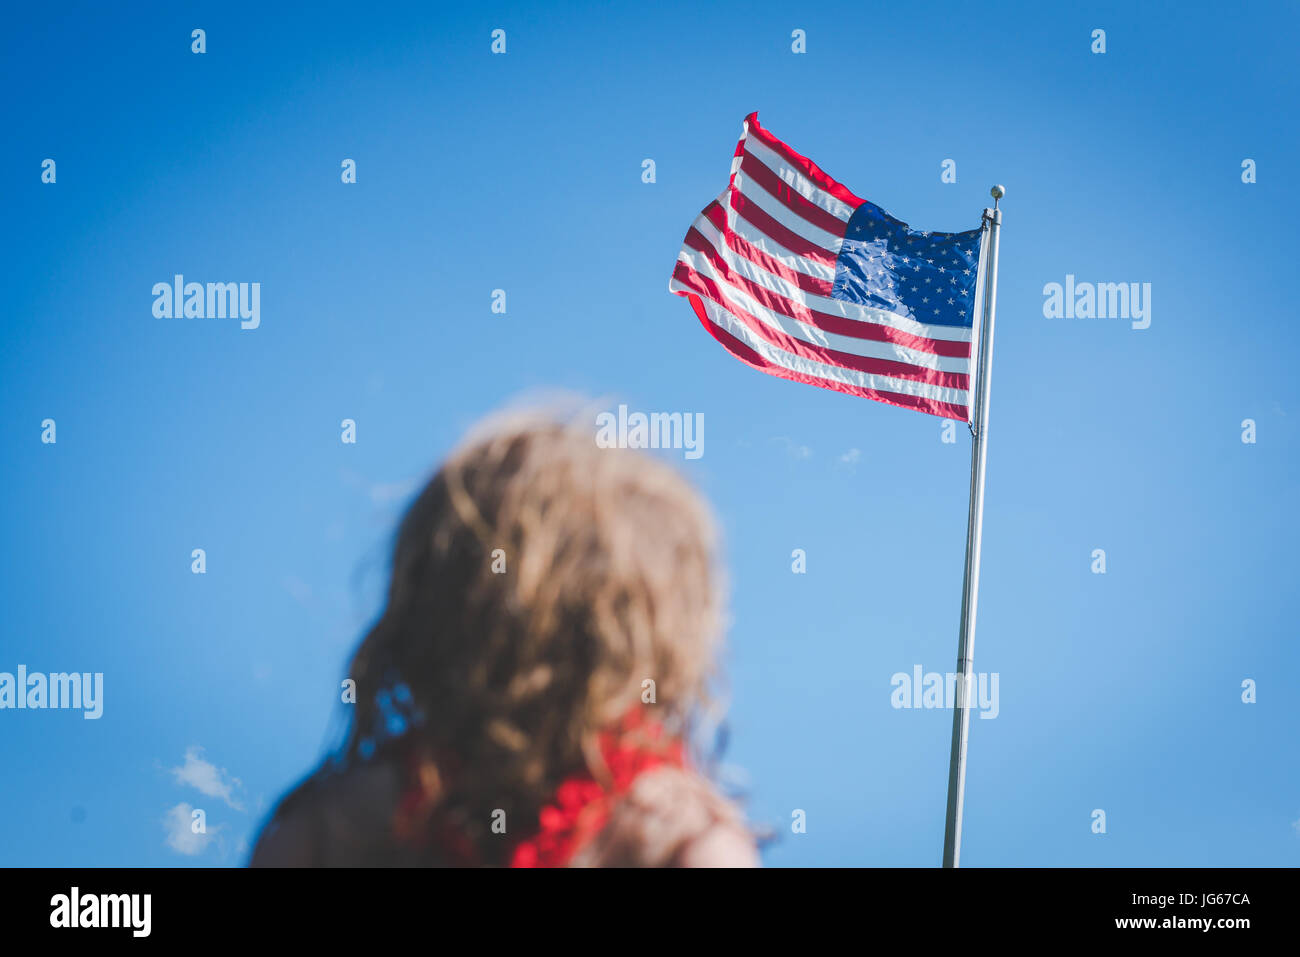 Una niña mira a la bandera americana. Imagen De Stock